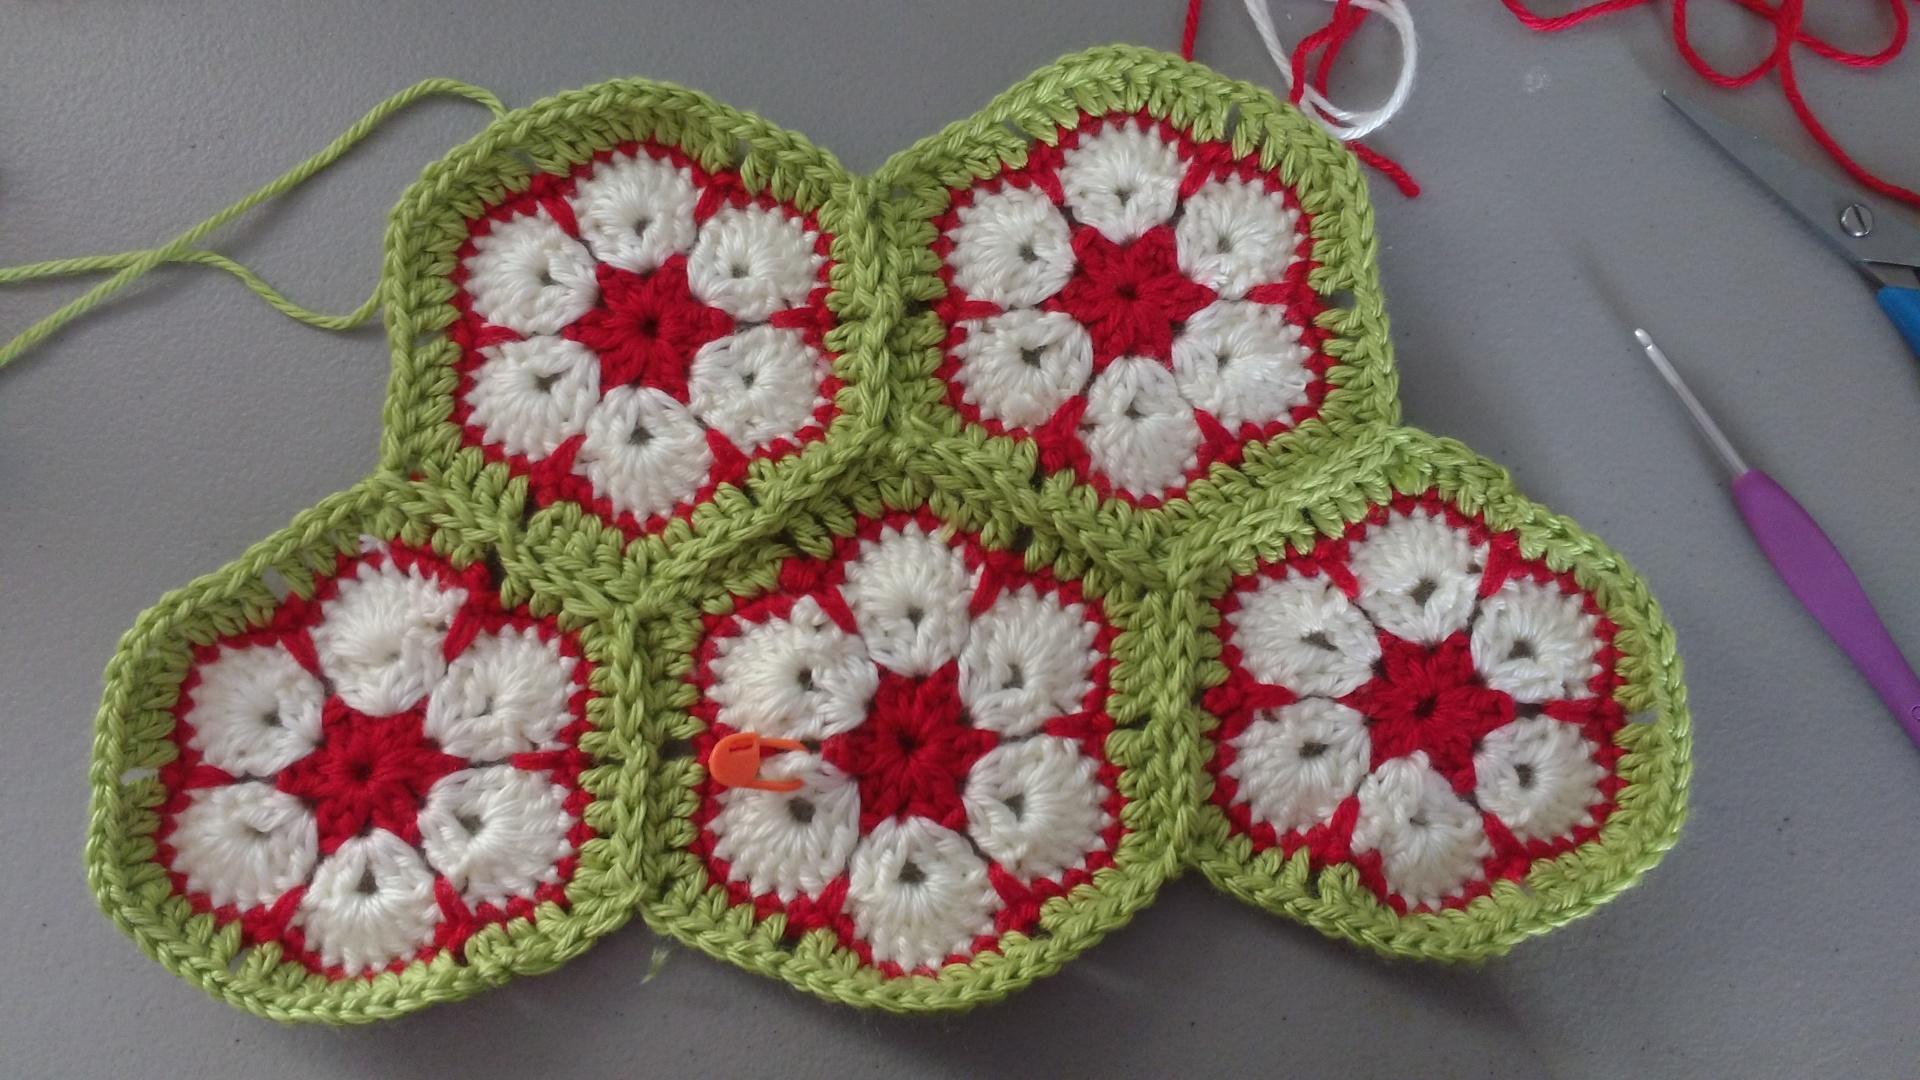 Crochet Hanging Flower Basket Pattern : African flower Hanging Basket - funkifybers.com